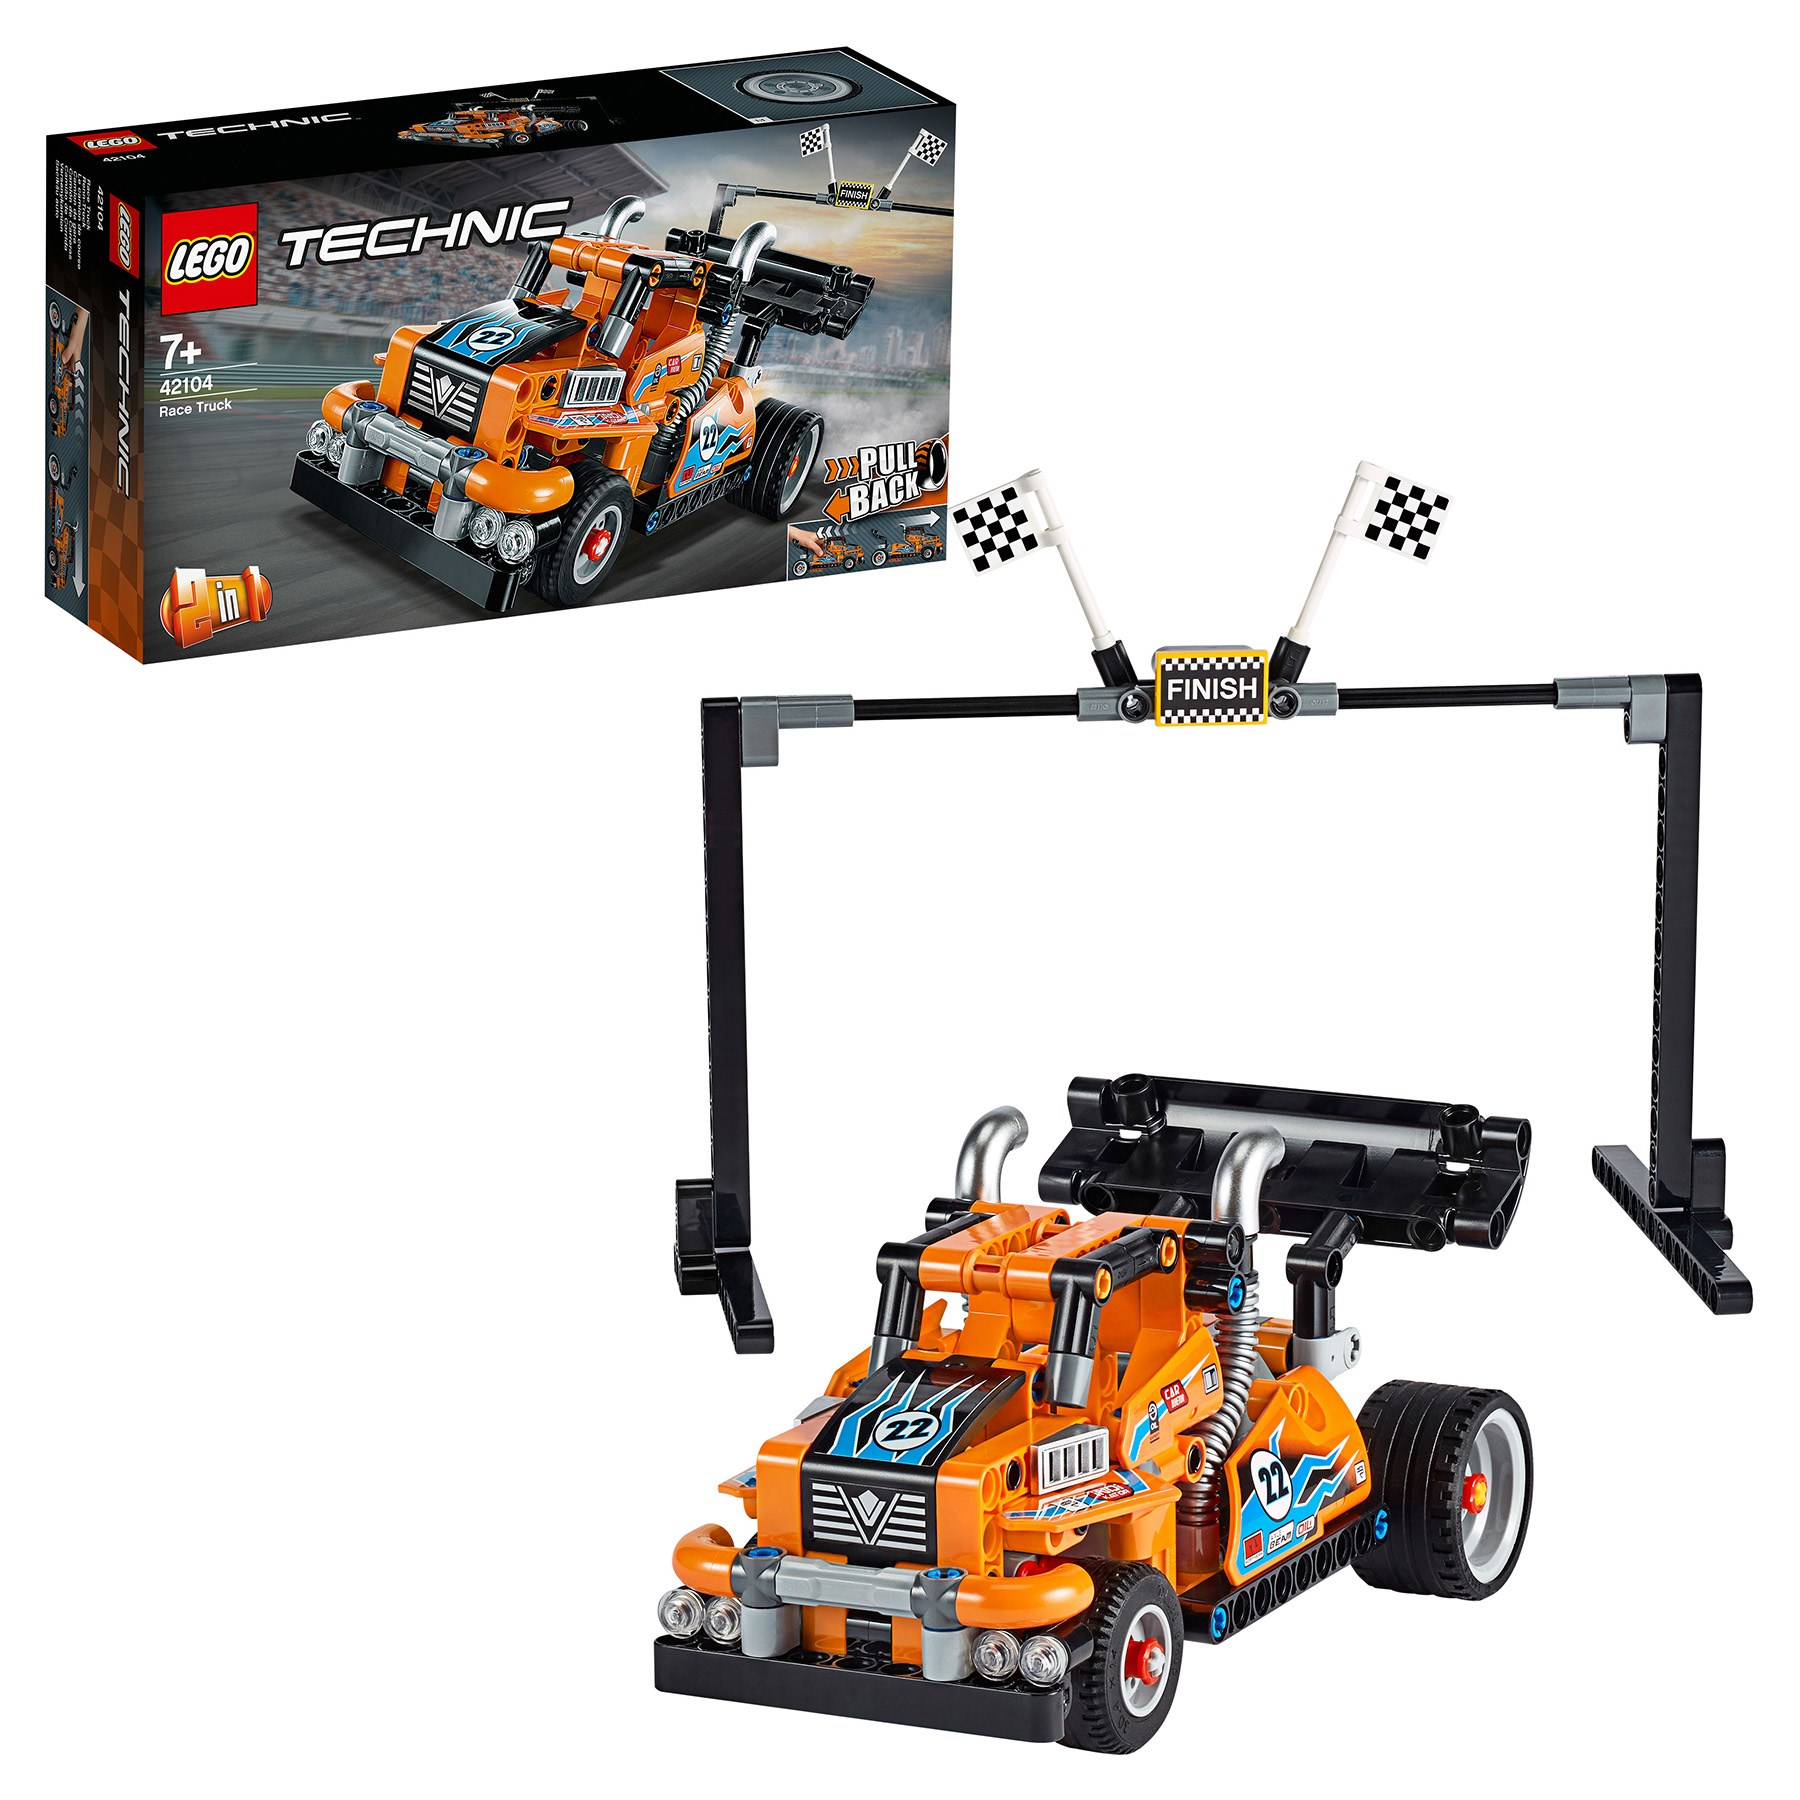 Designer Lego Technic 42104 Racing Truck